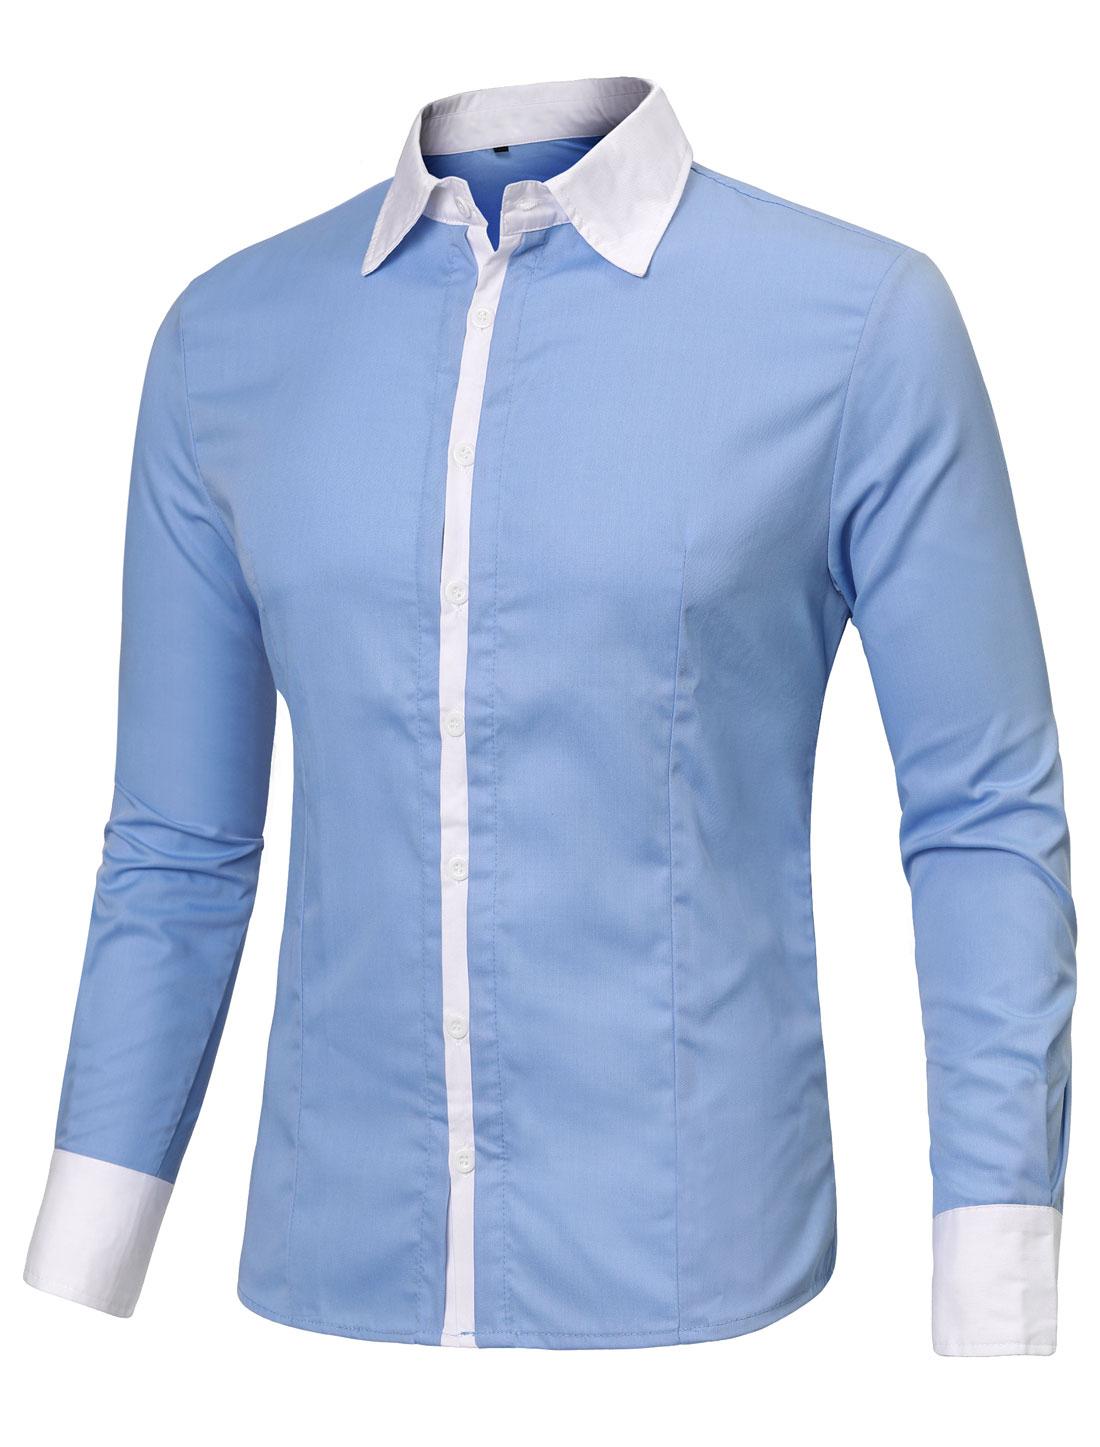 Men Buttons Up Closure Point Collar Fashion Top Shirt Sky Blue M